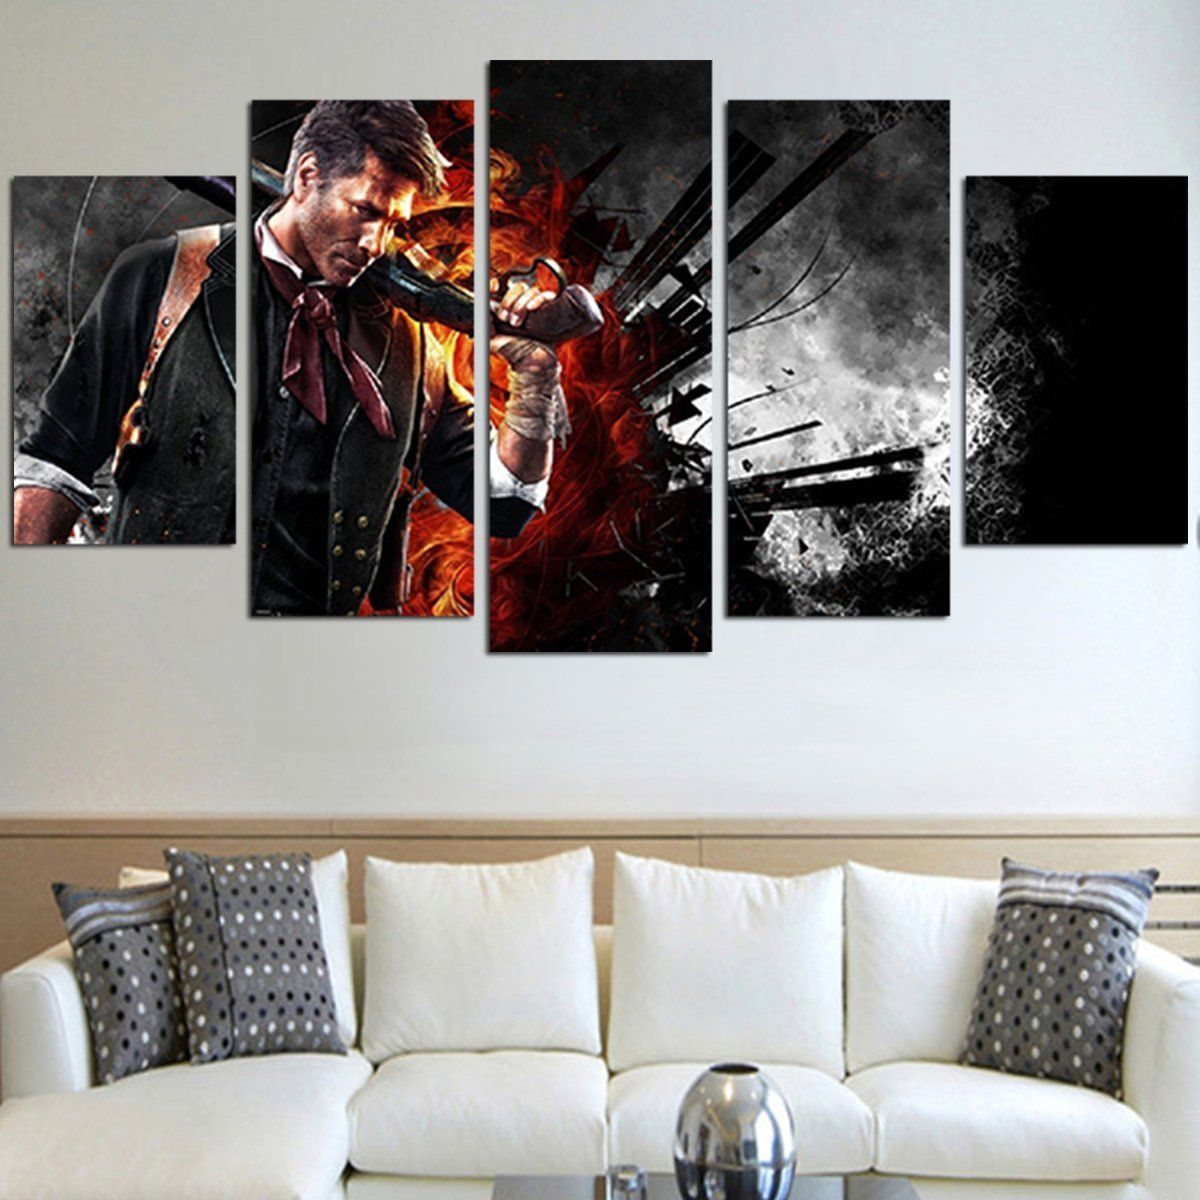 Booker dewitt bioshock infinite wall art canvas products canvas